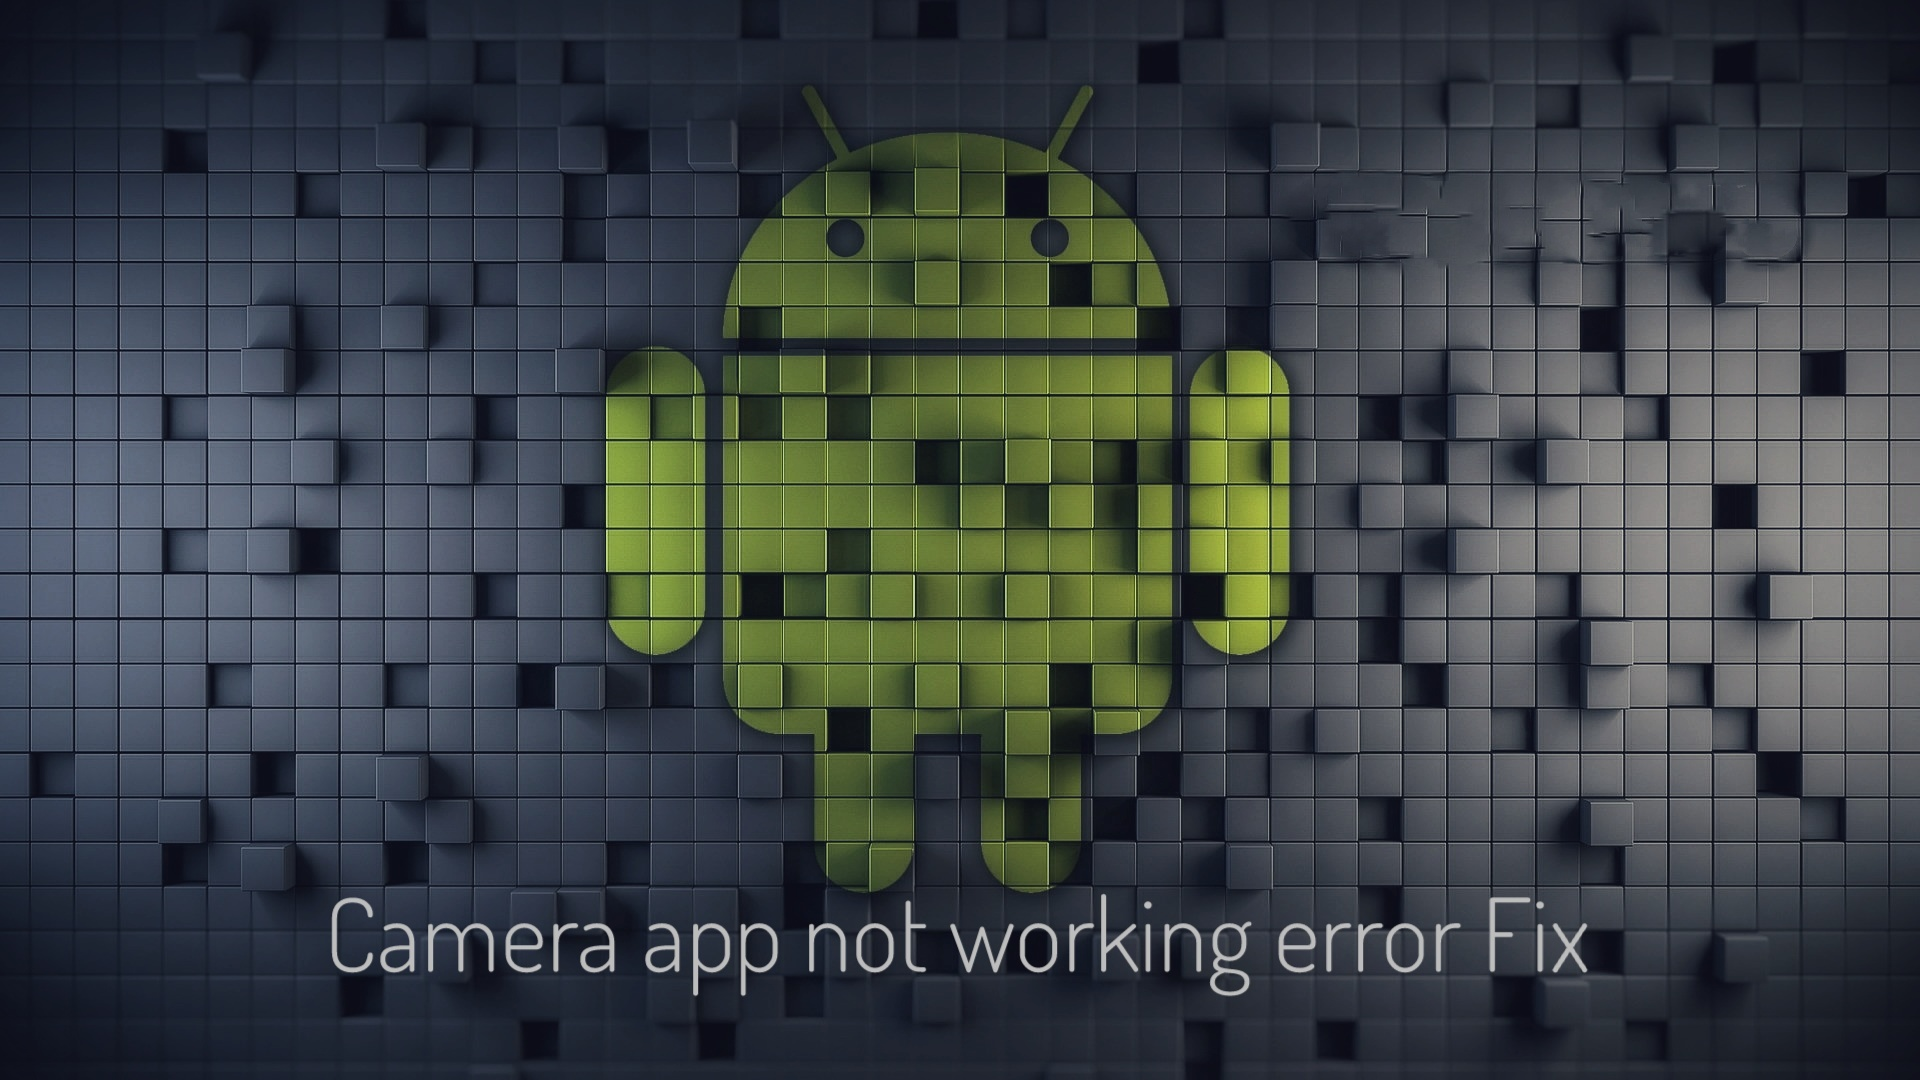 Camera app not working error fix - TECNO MOBILE COMMUNITY